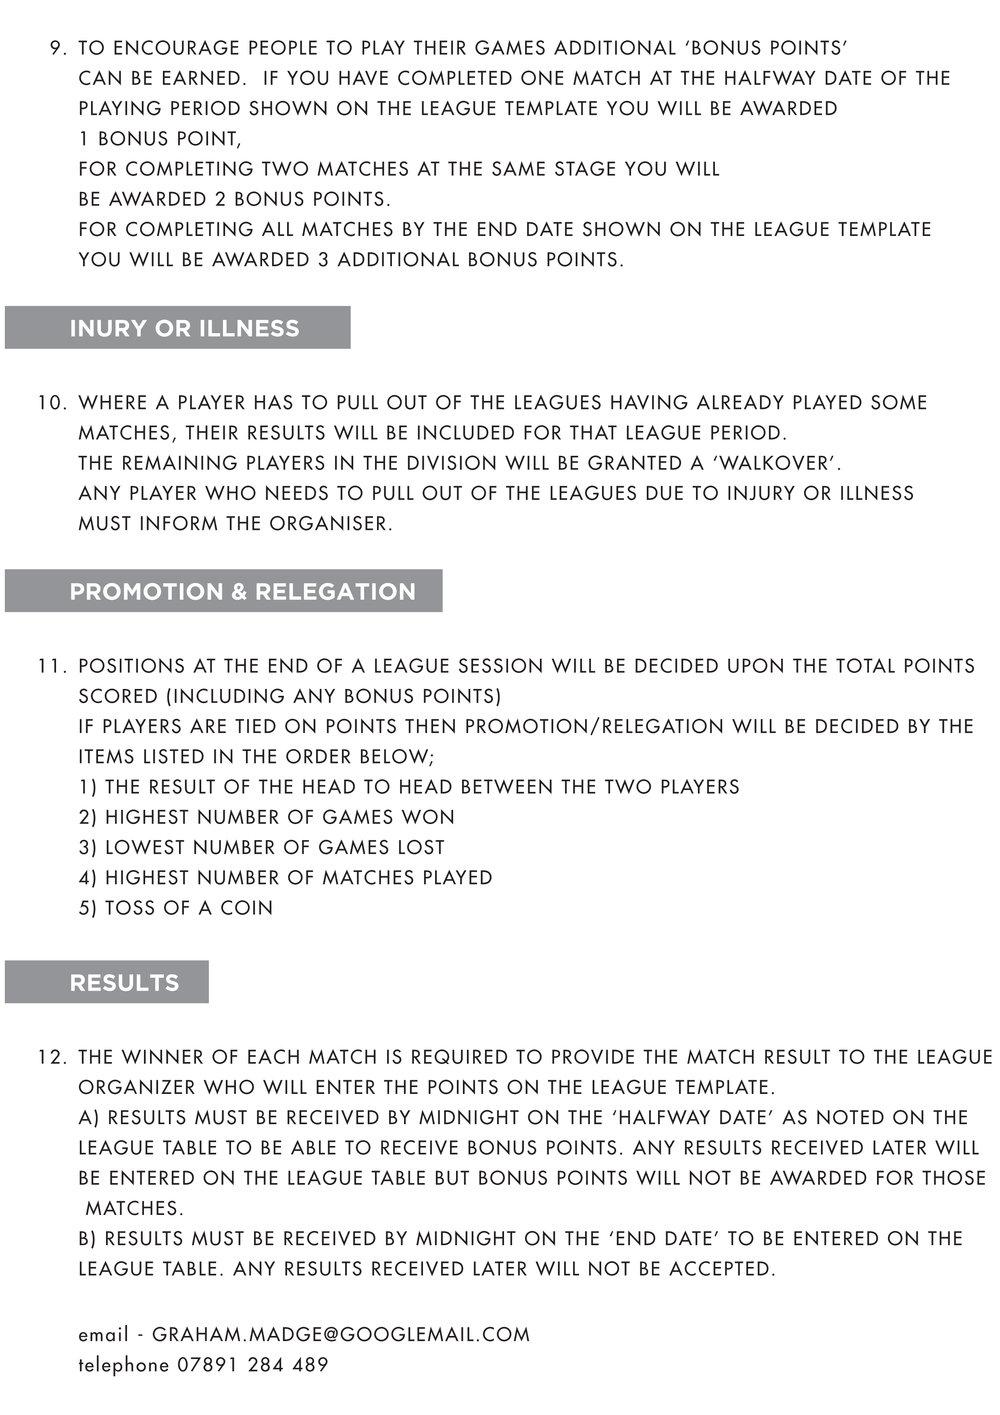 league rules2.jpg